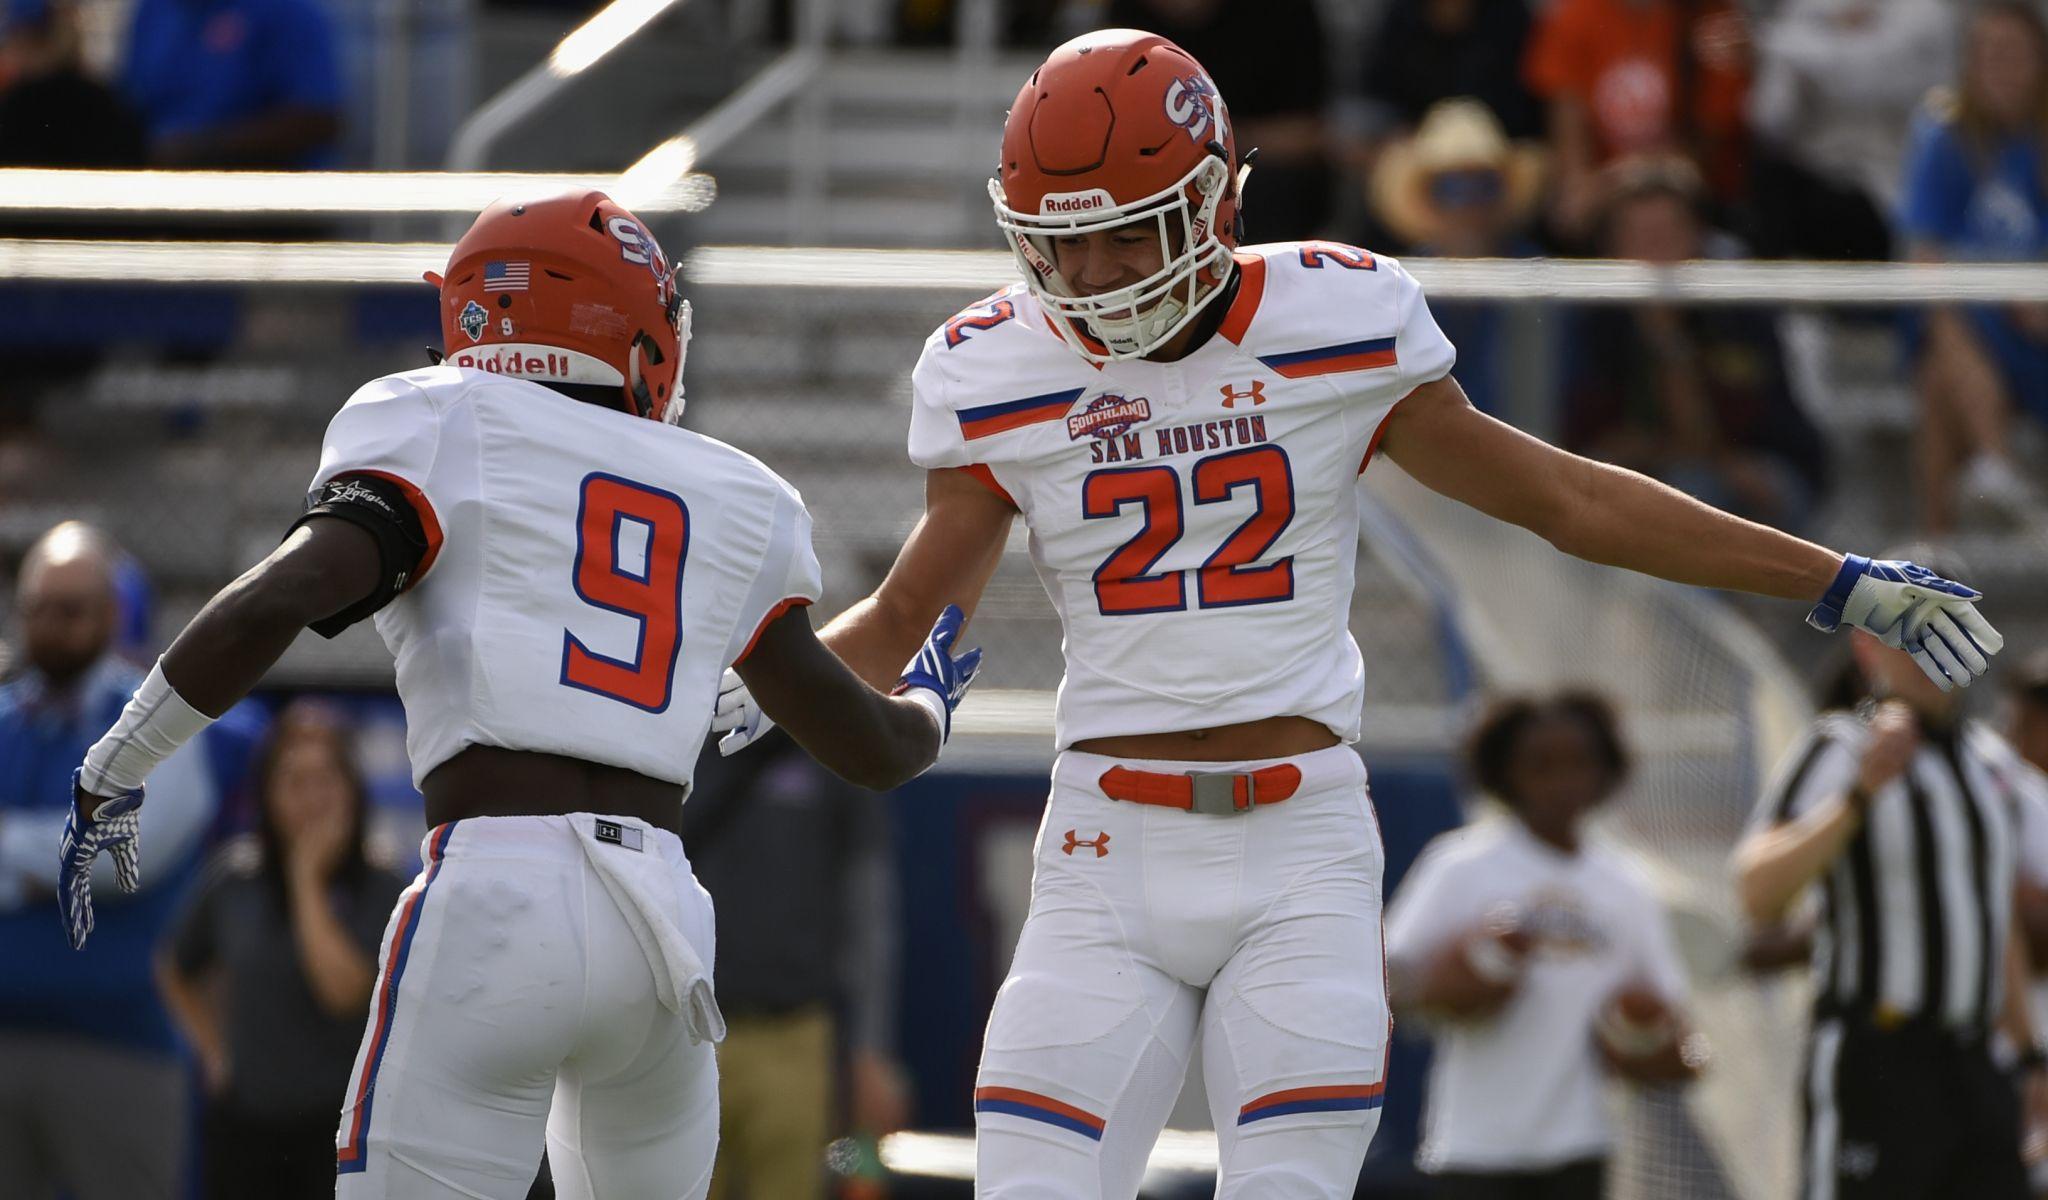 College football preview: Sam Houston State at North Dakota